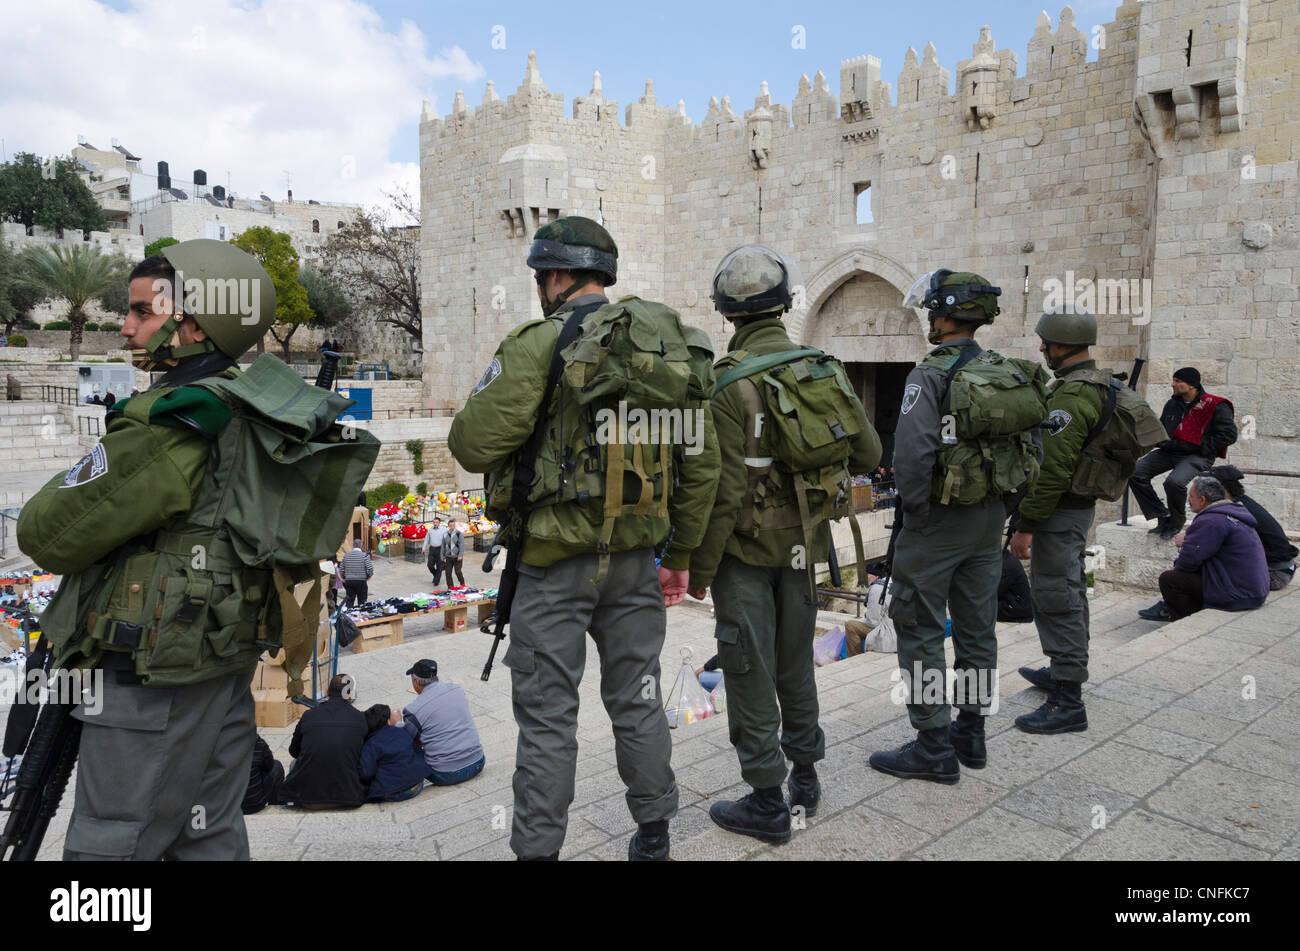 Border patrols at the Damascus gate during Land Day potests. Jerusalem Old City. Israel. - Stock Image